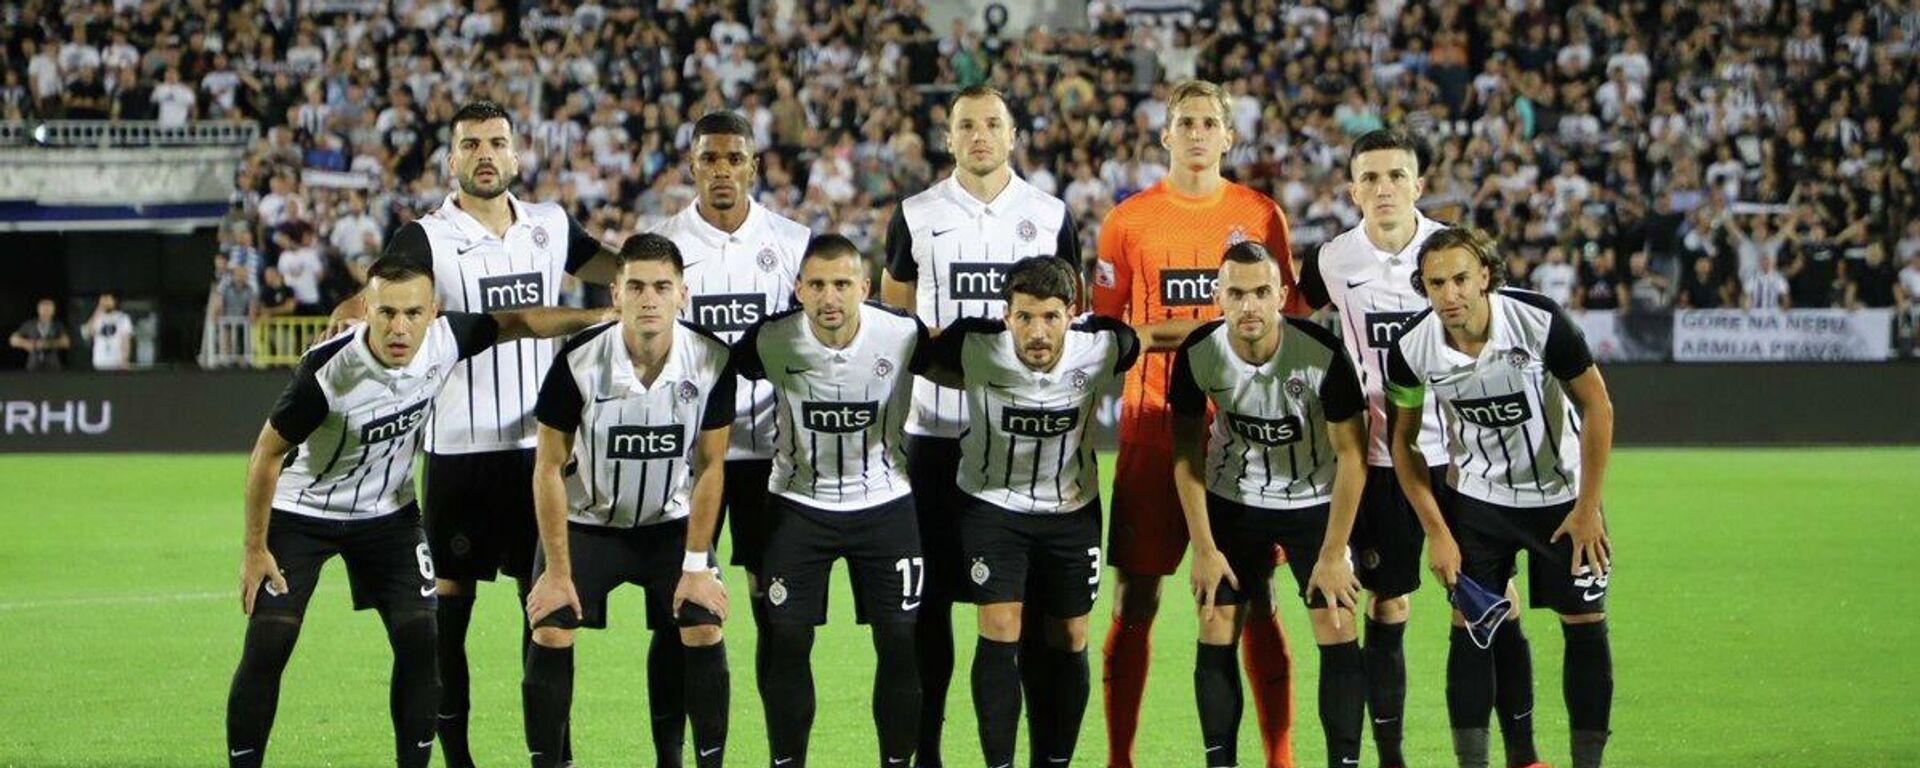 Fudbaleri Partizana pred meč sa Sočijem - Sputnik Srbija, 1920, 27.09.2021